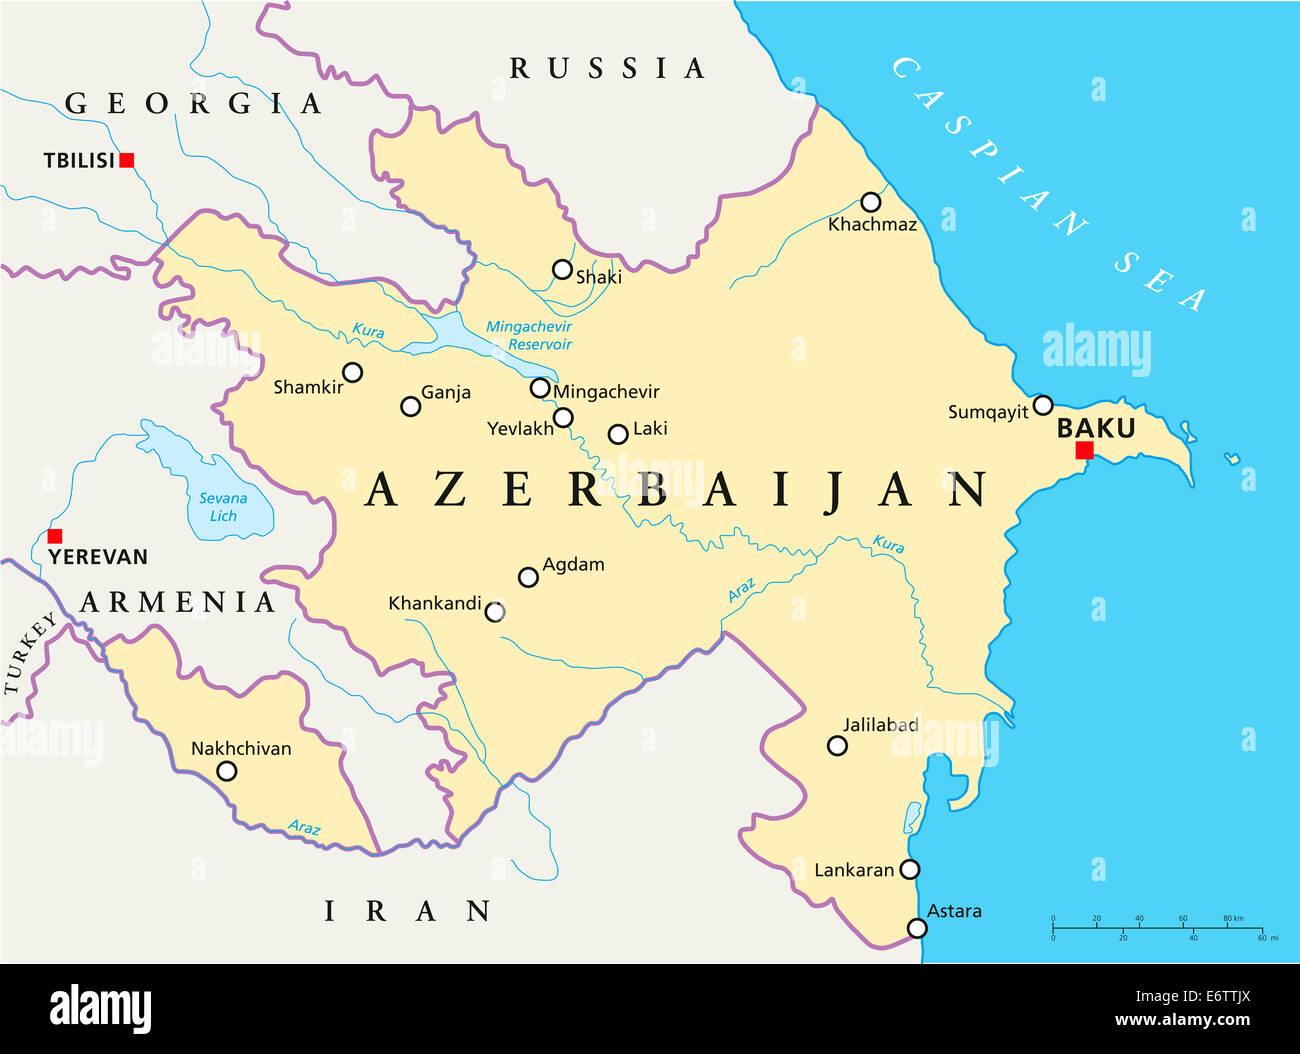 Azerbaijan Political Map With Capital Baku National Borders Most - Azerbaijan map